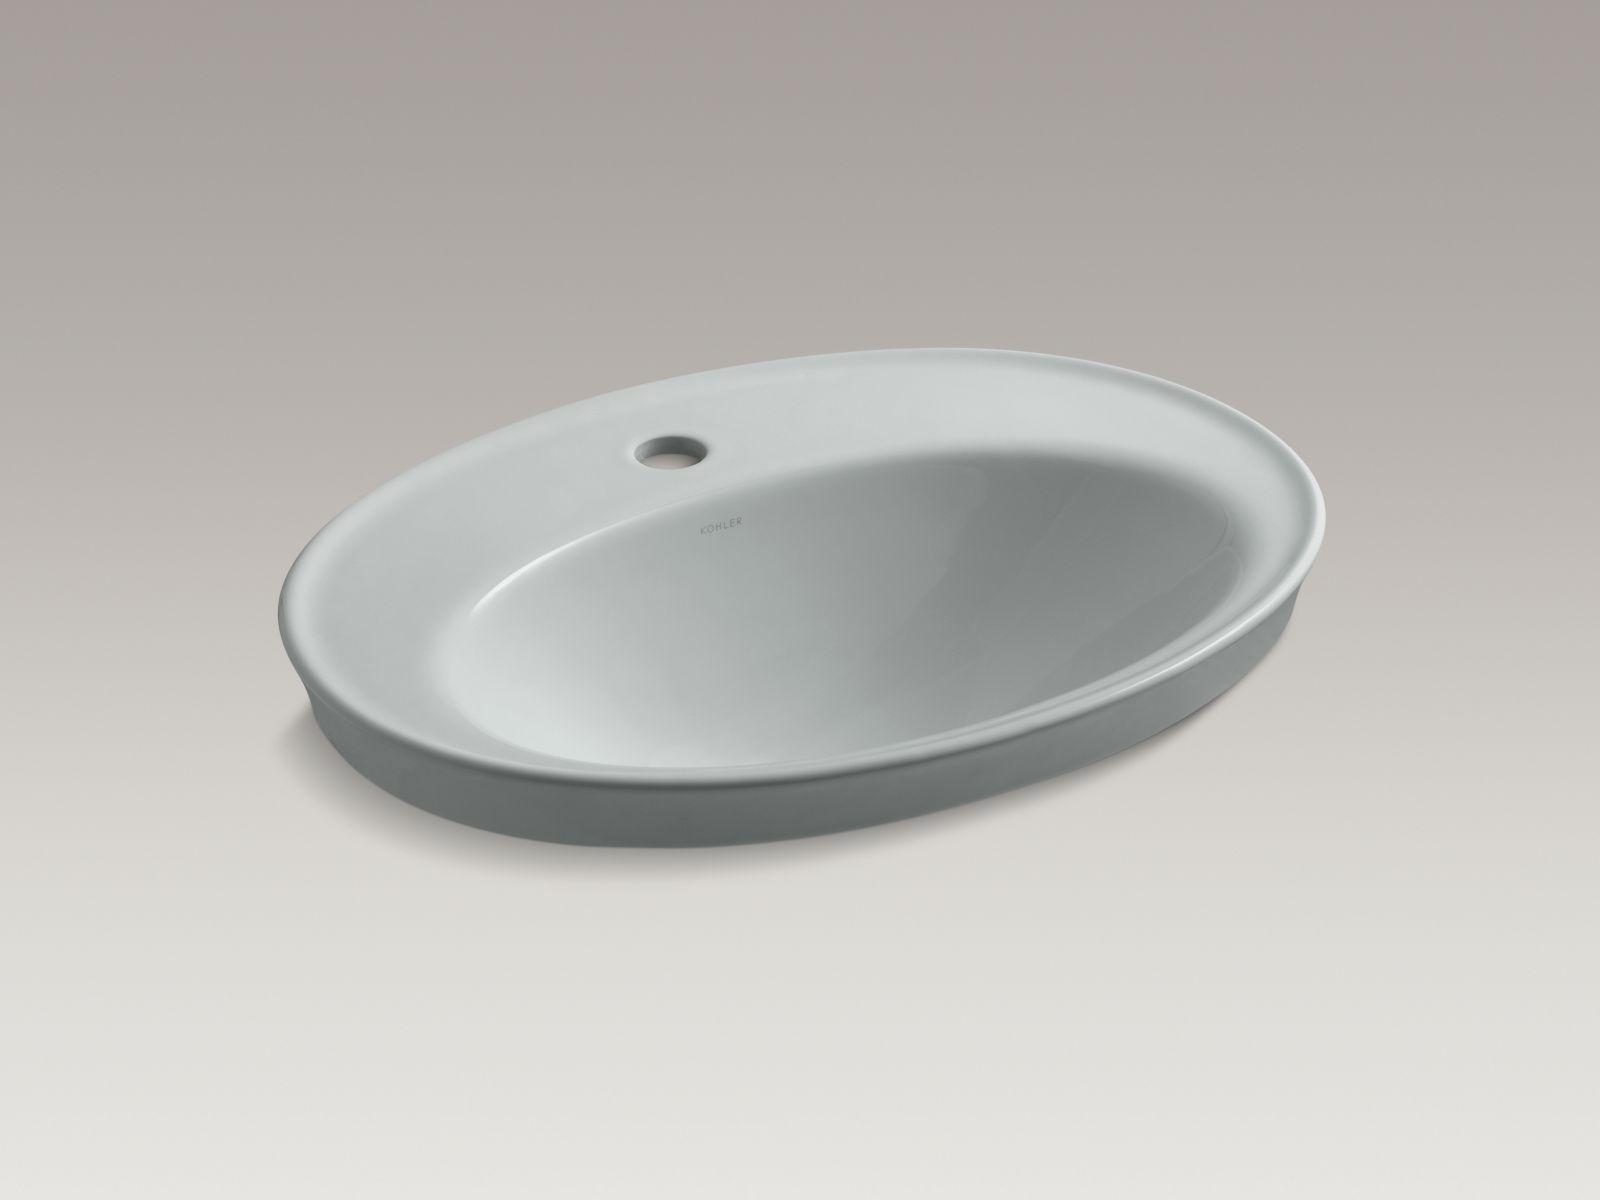 Kohler K-2075-1-95 Serif Self-Rimming Lavatory Ice Grey